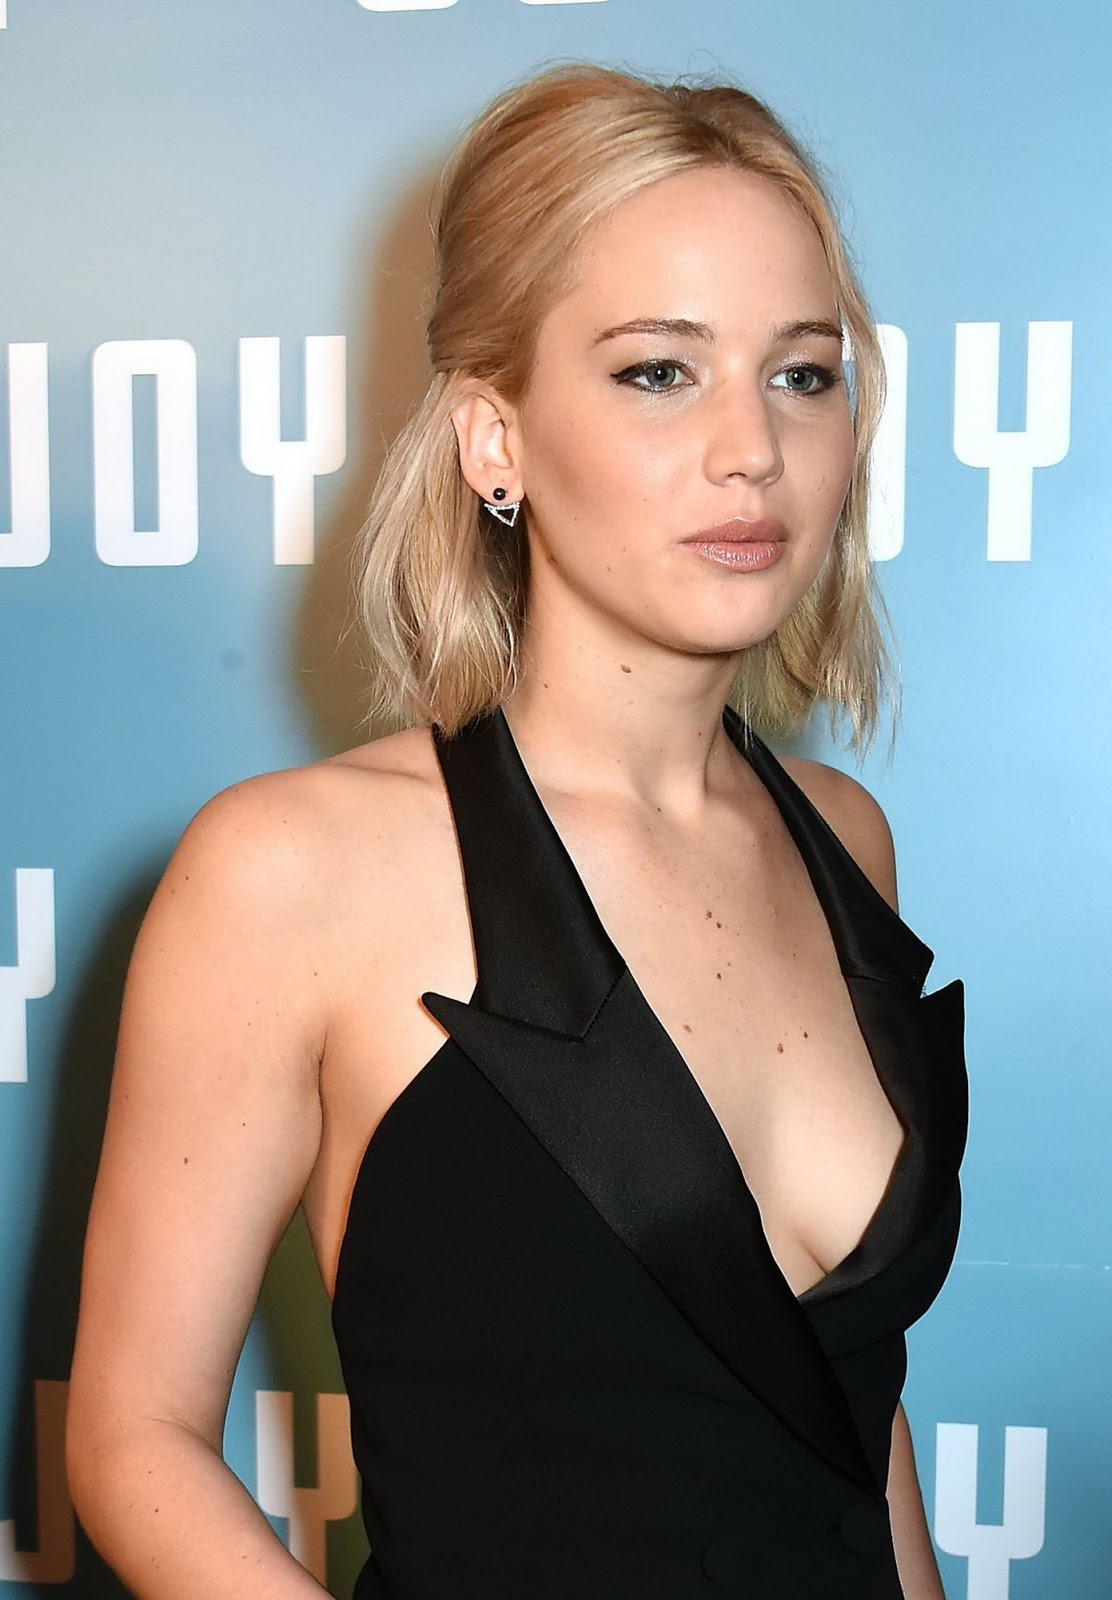 Arts Cross Stitch: Actress, @ Jennifer Lawrence - Joy ...